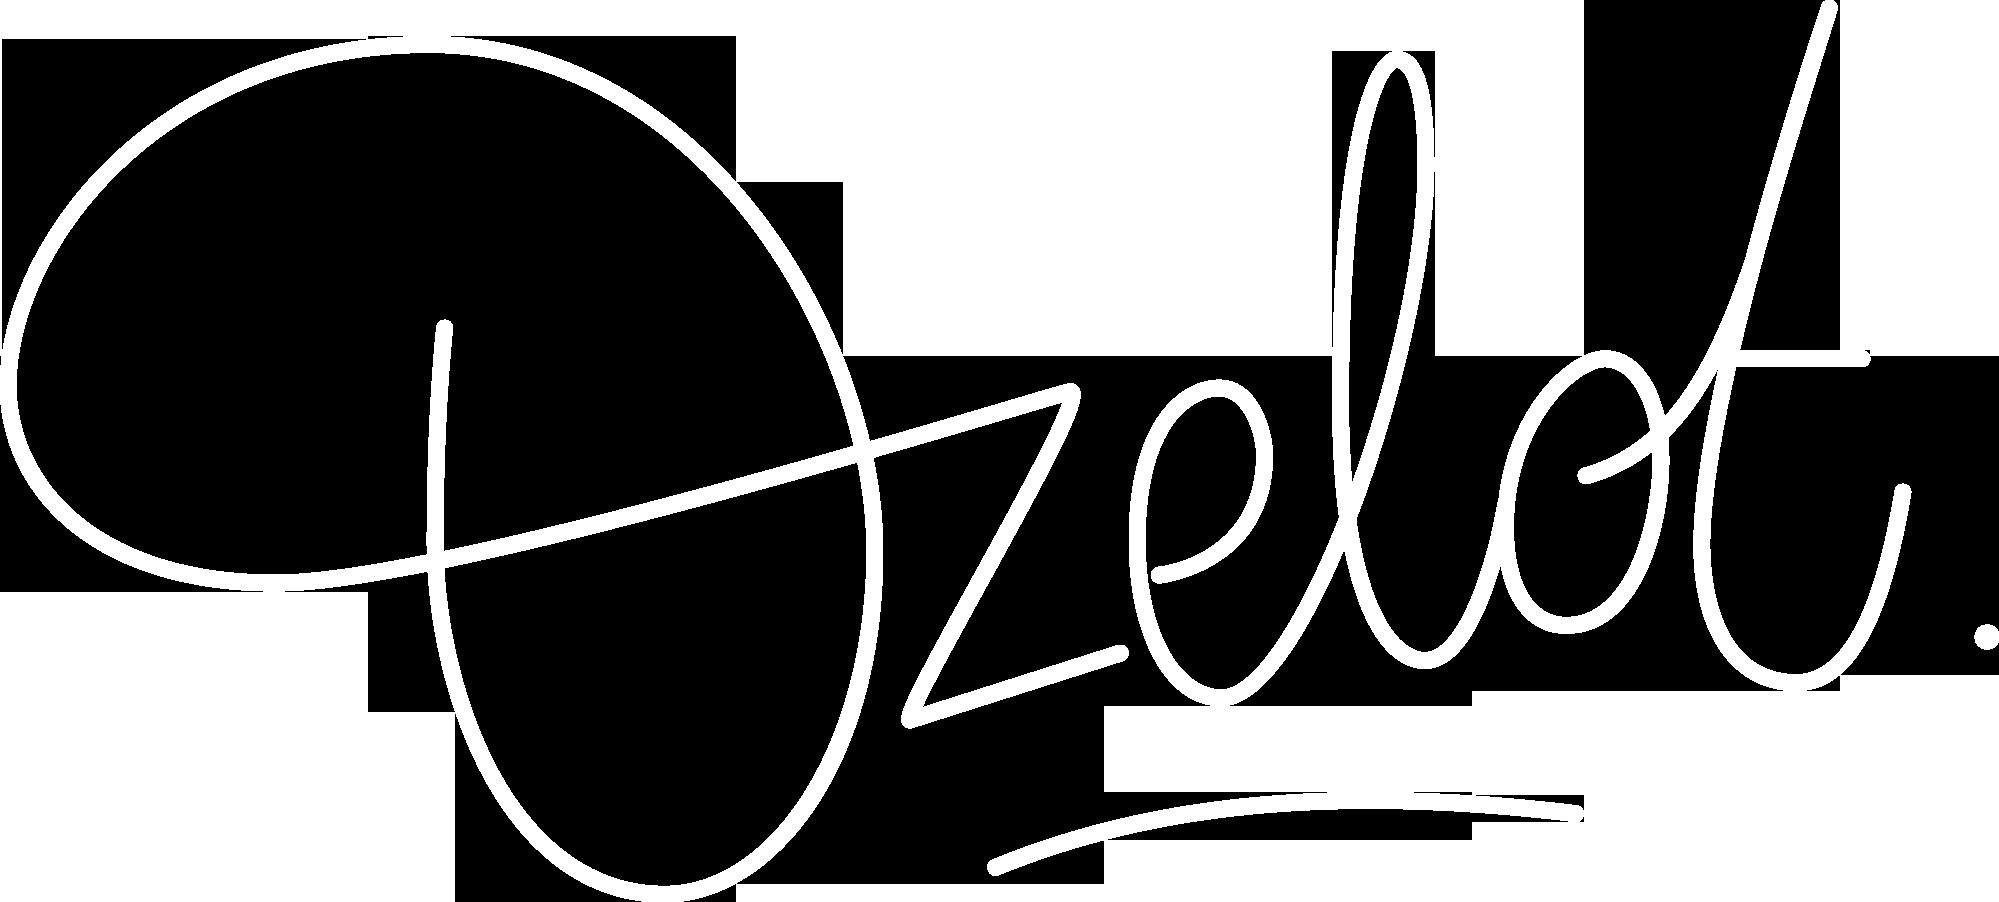 OZELOT